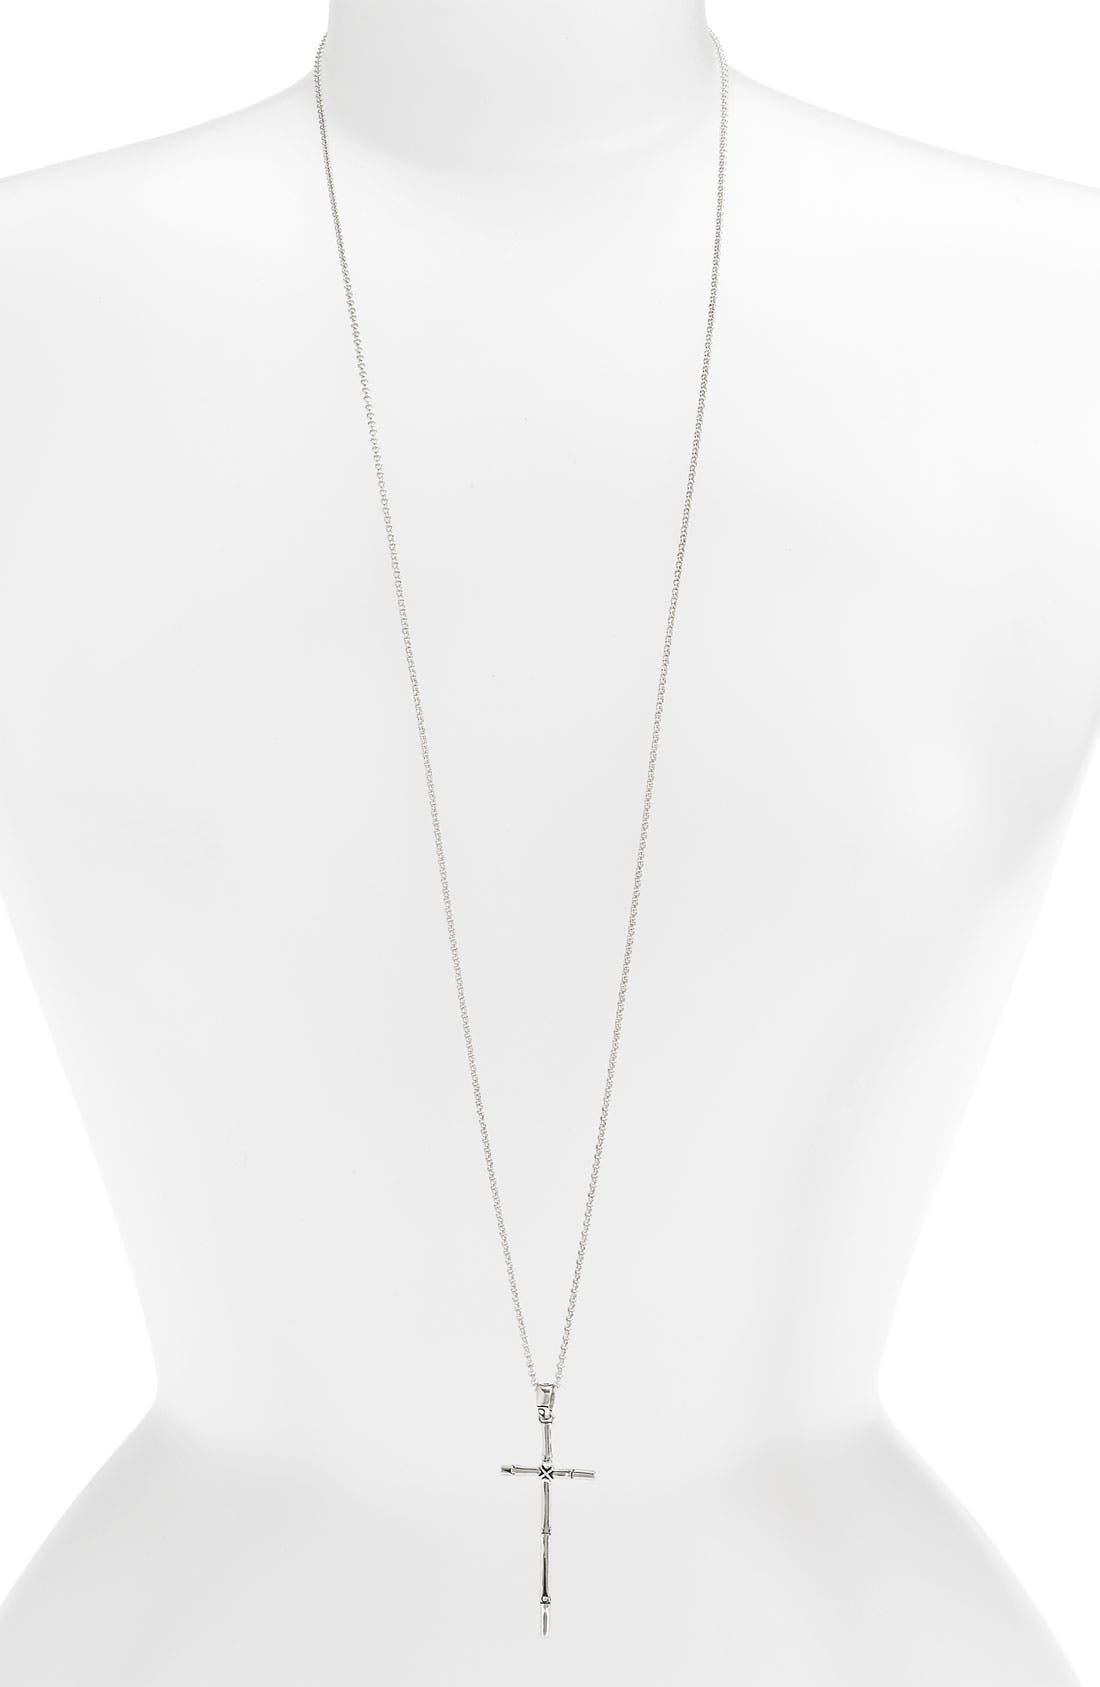 Main Image - John Hardy 'Bamboo' Long Cross Pendant Necklace